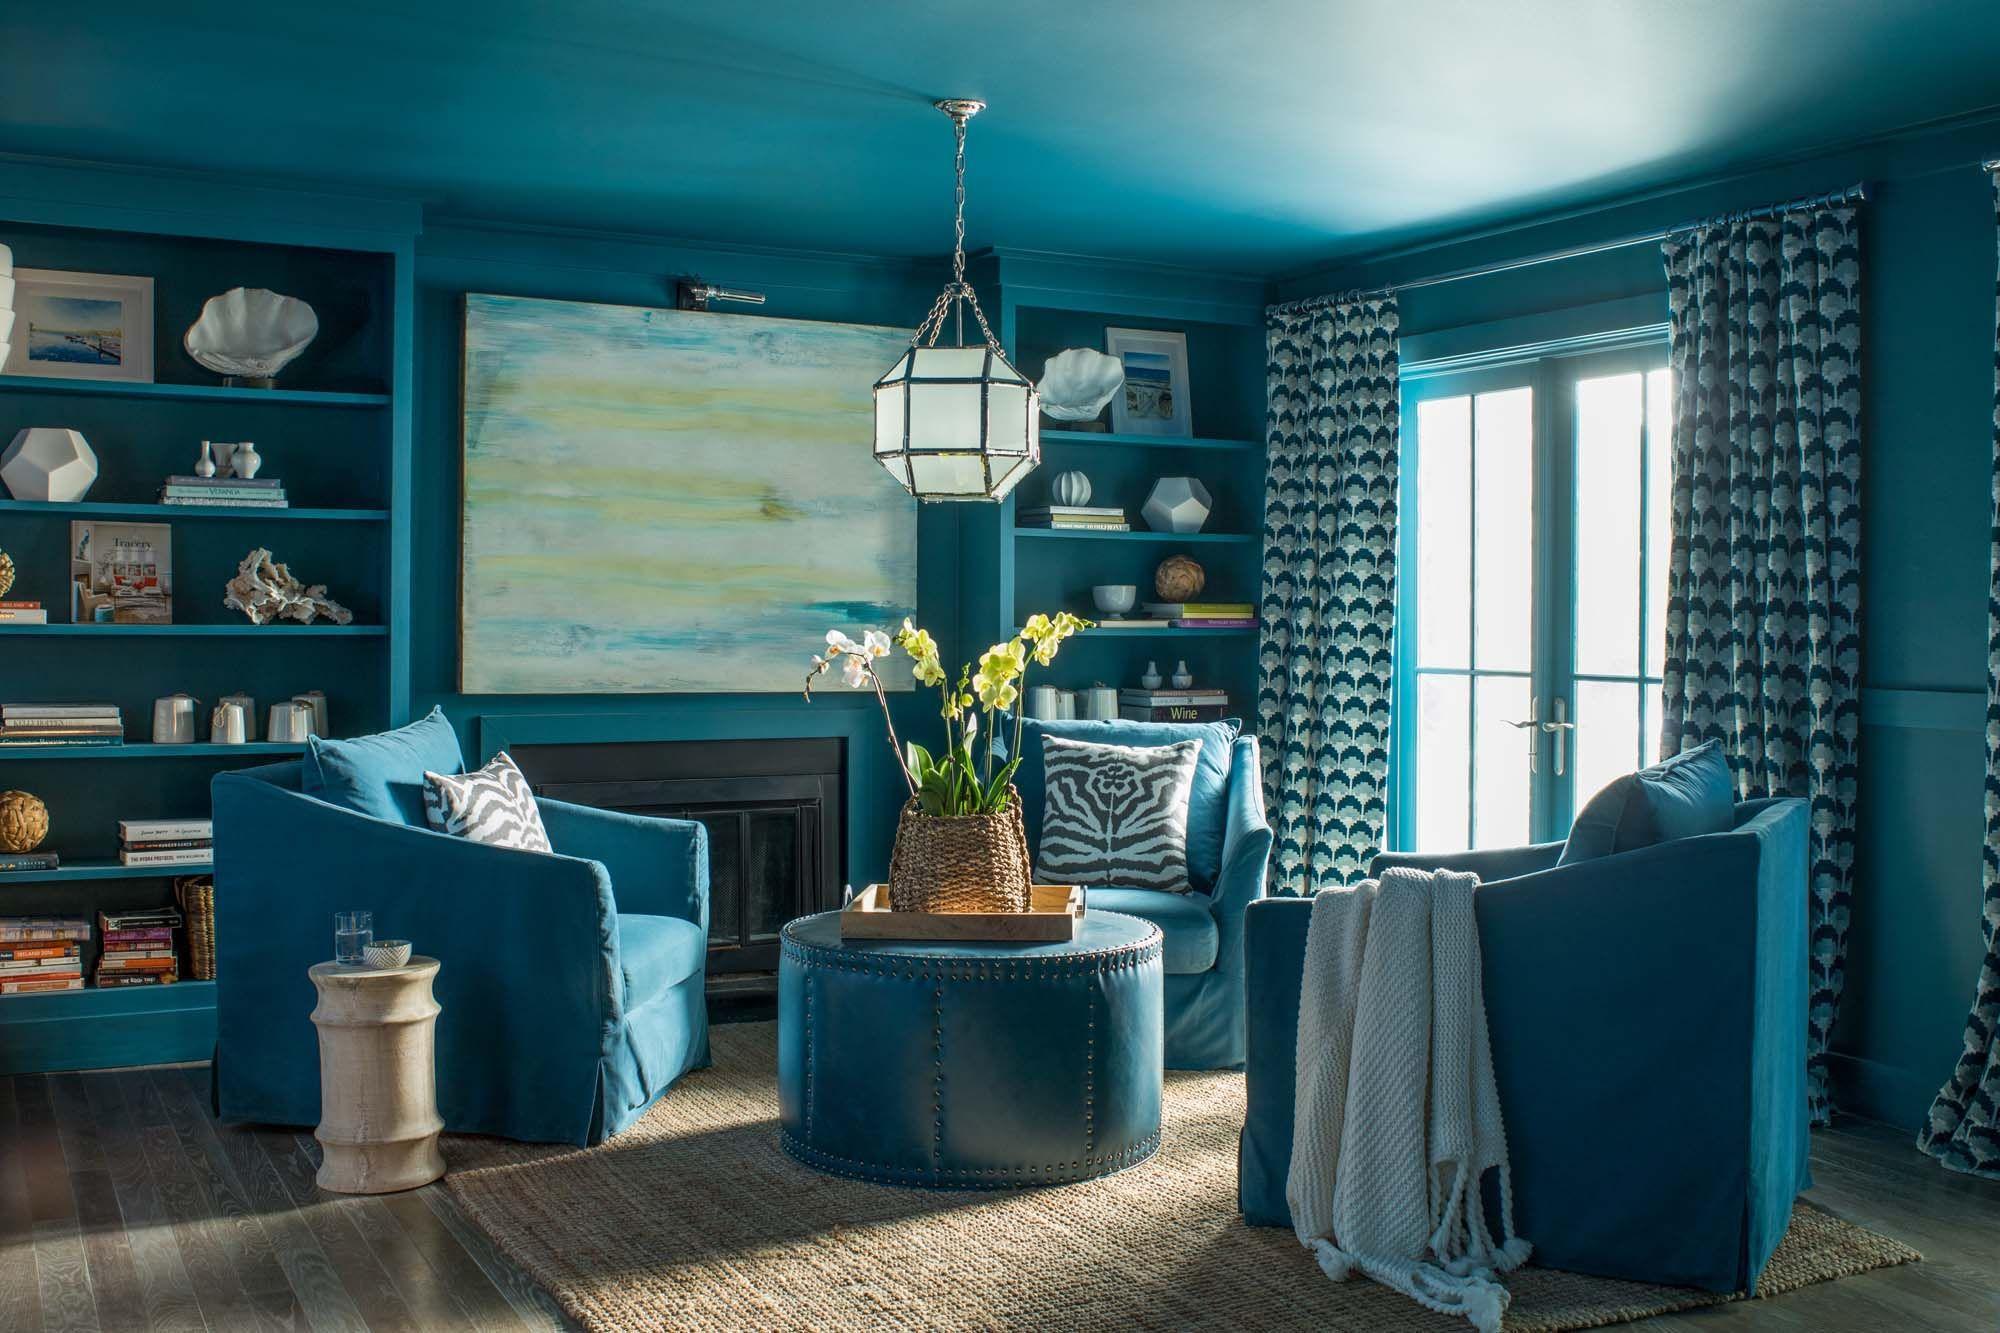 Designers Benjamin Moore Living Room Colors Room Colors Living Room Color Blue paint for living room walls